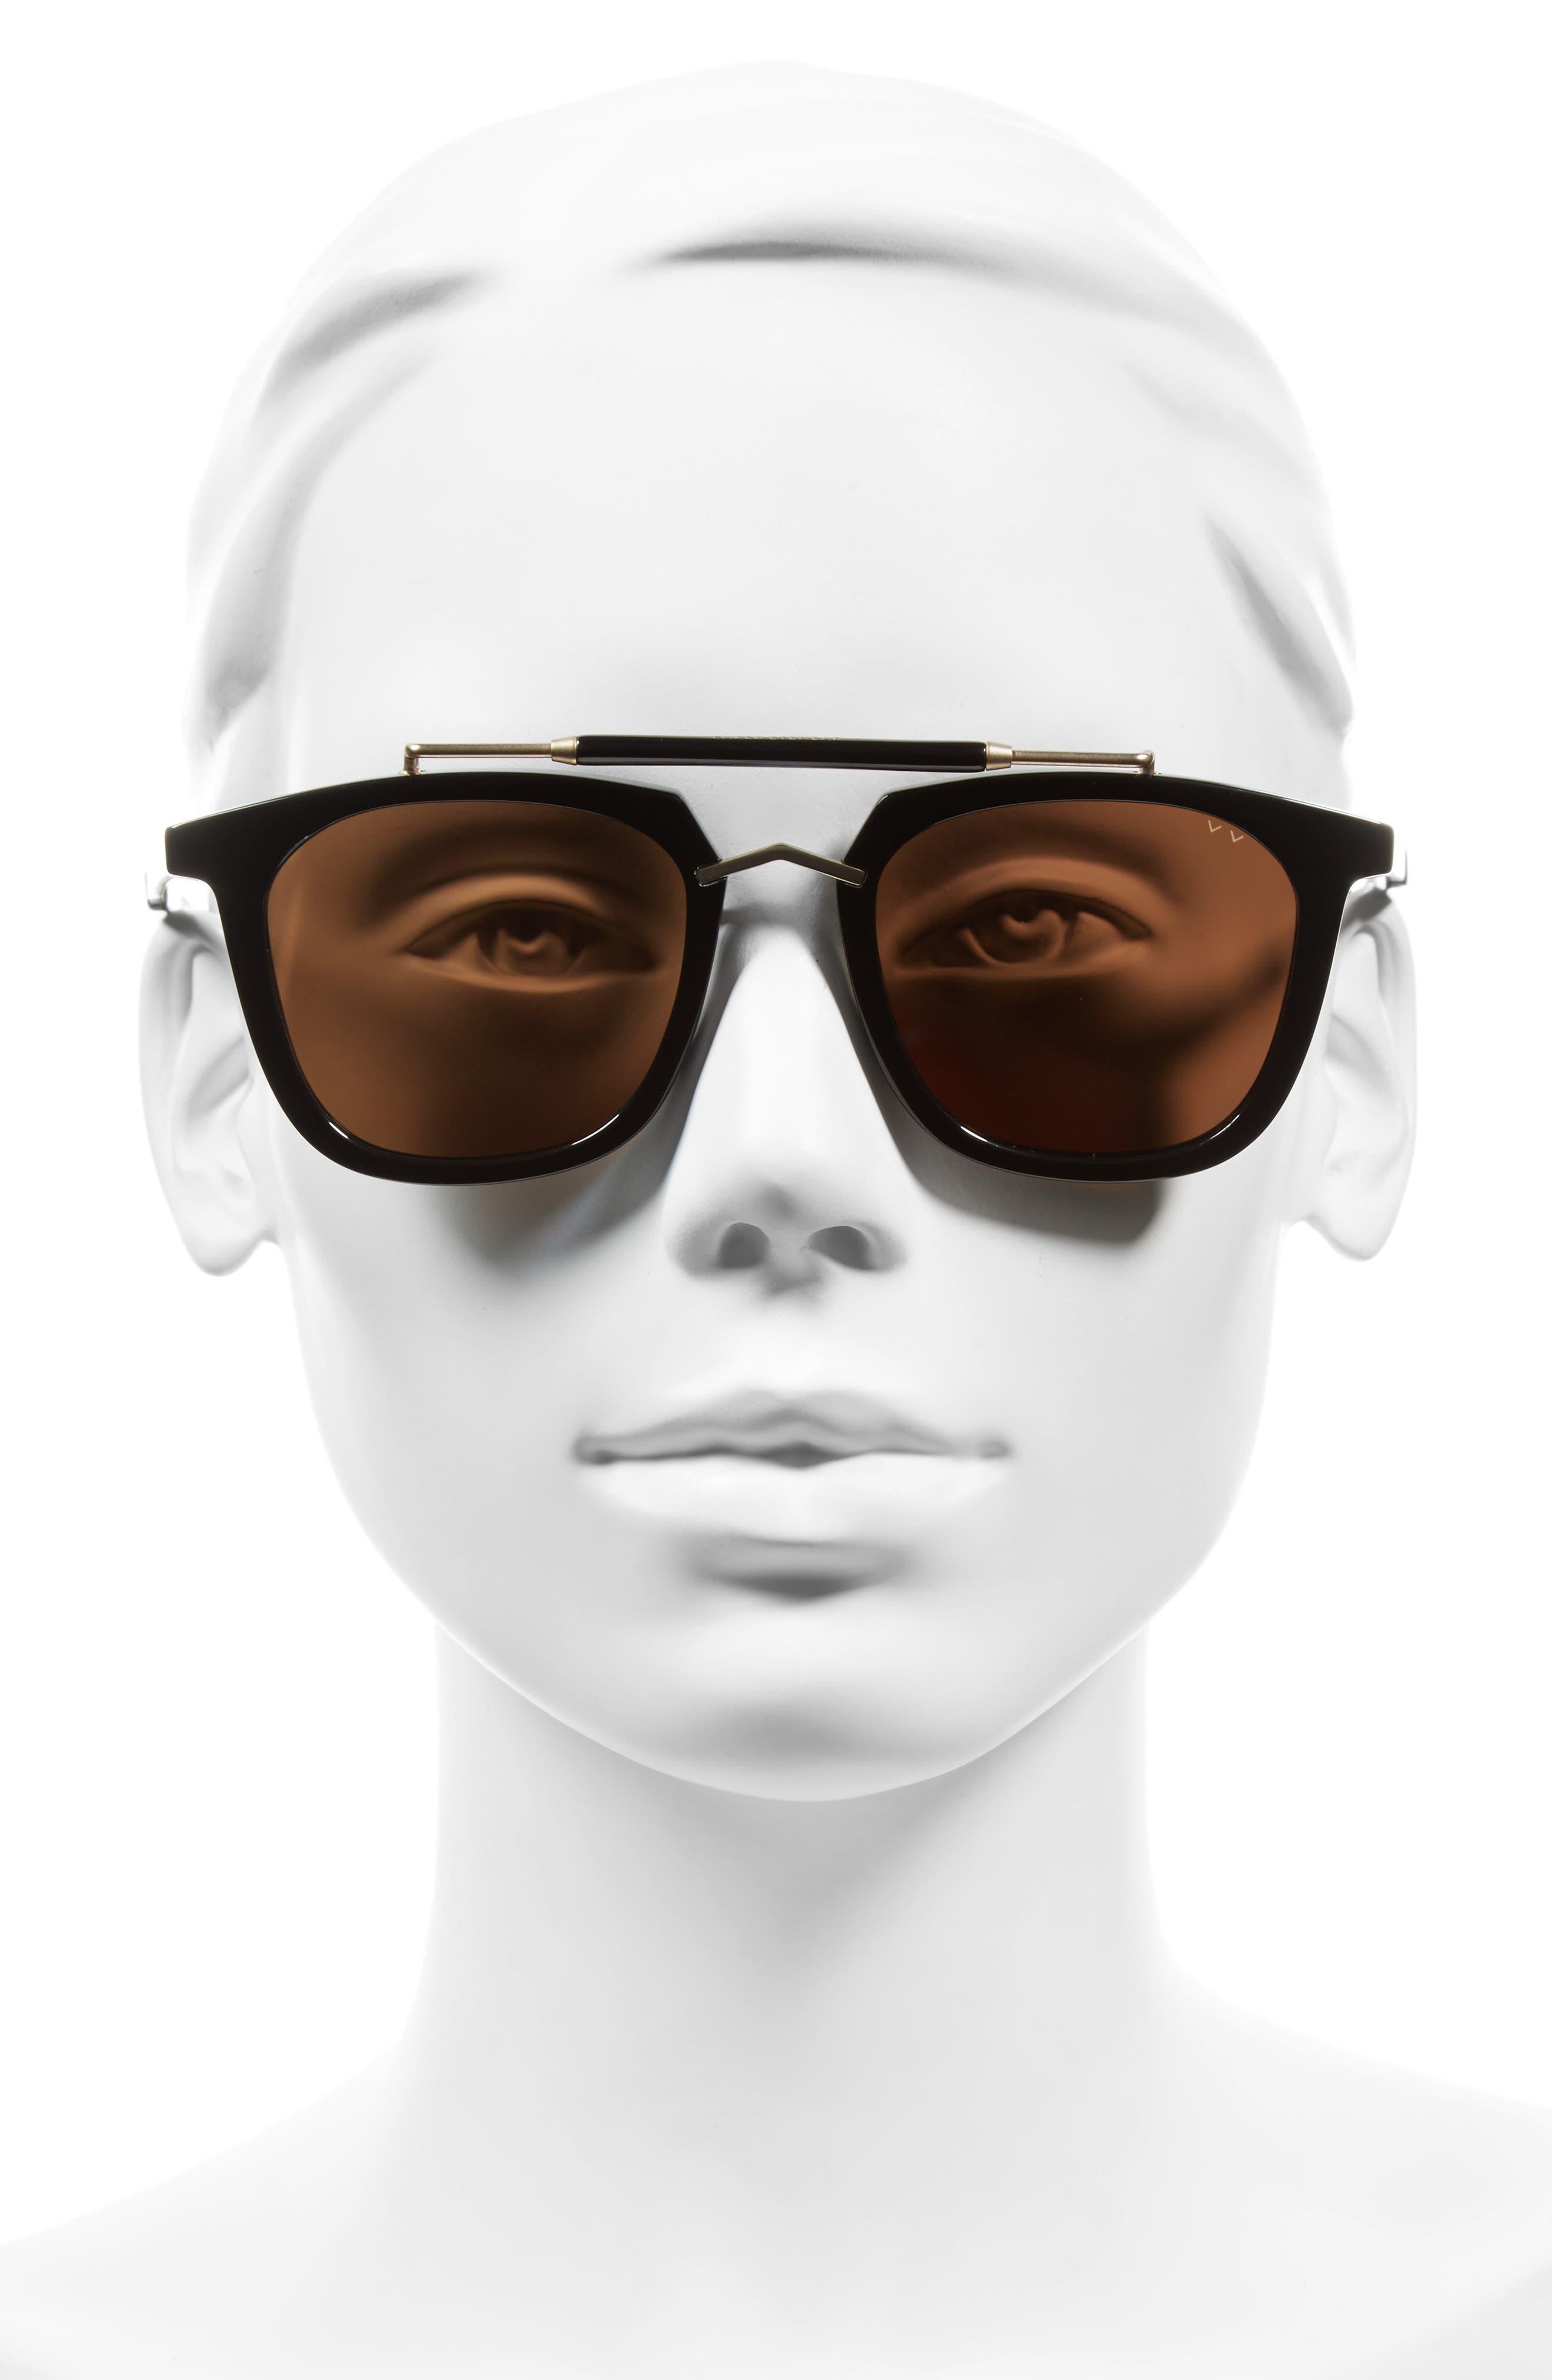 Camels & Caravans 50mm Retro Sunglasses,                             Alternate thumbnail 2, color,                             BLACK/ GOLD BROWN